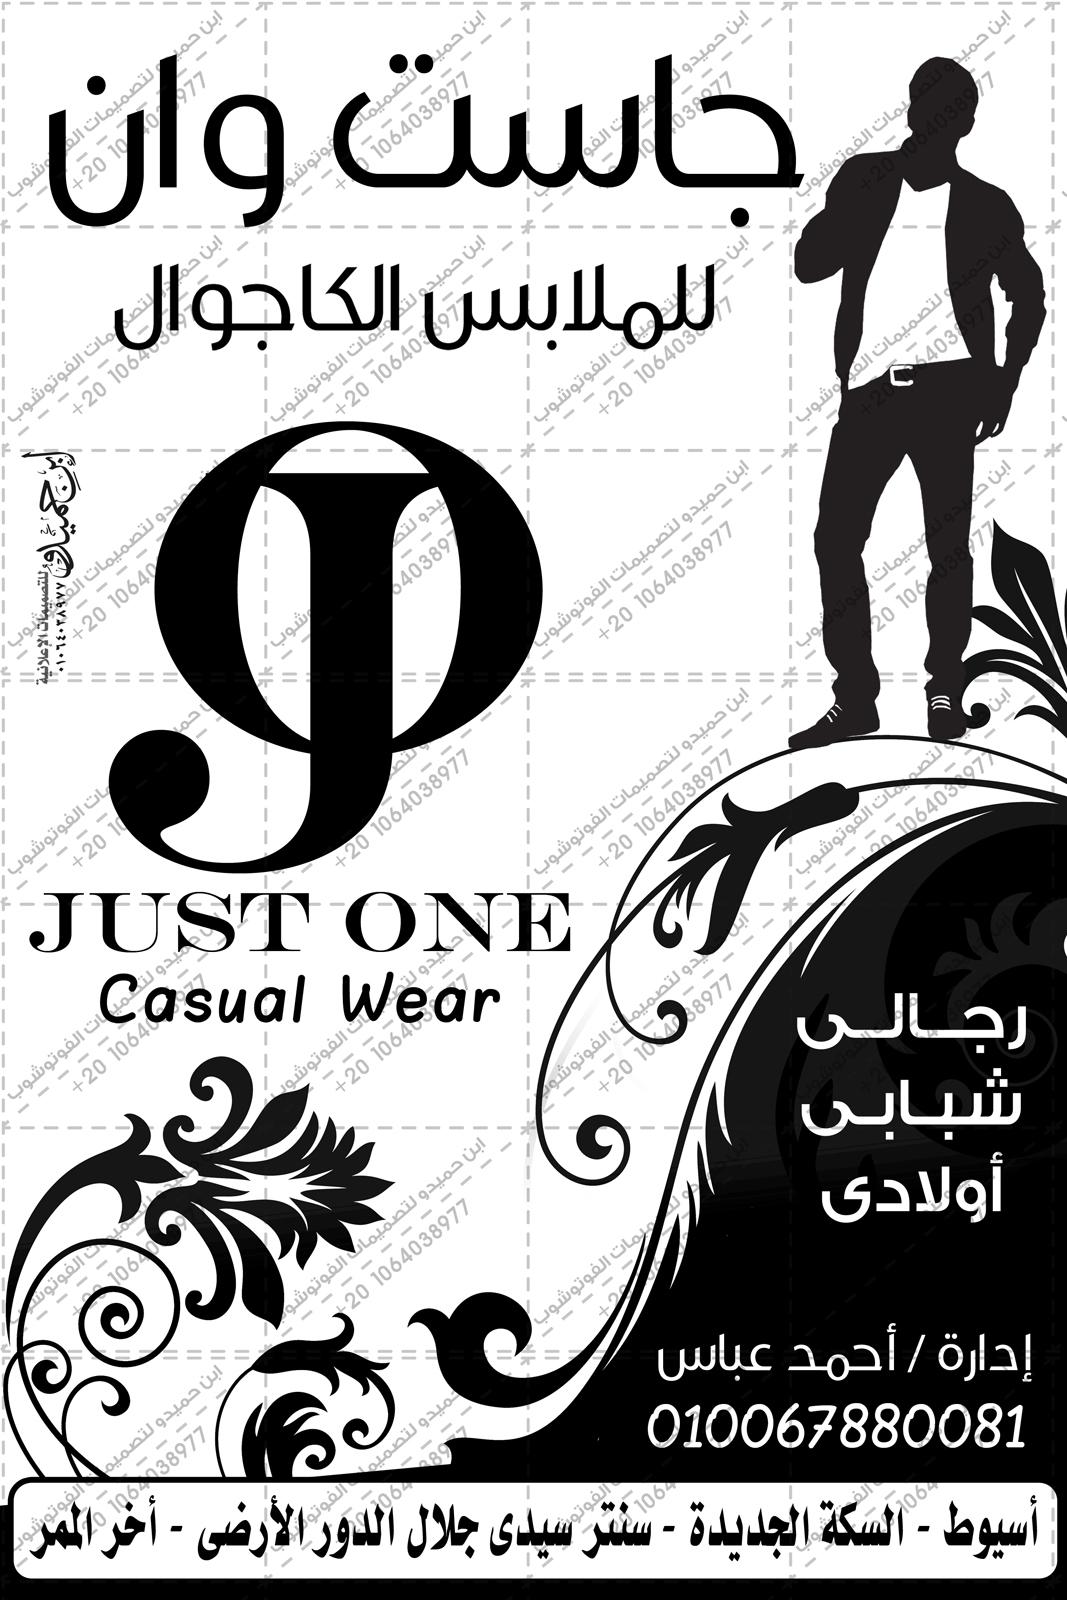 879649e1e تصميم سريلة كيس للطباعة - تصميم كيس محل ملابس شبابى كاجوال - ابن حميدو  لتصميمات الفوتوشوب